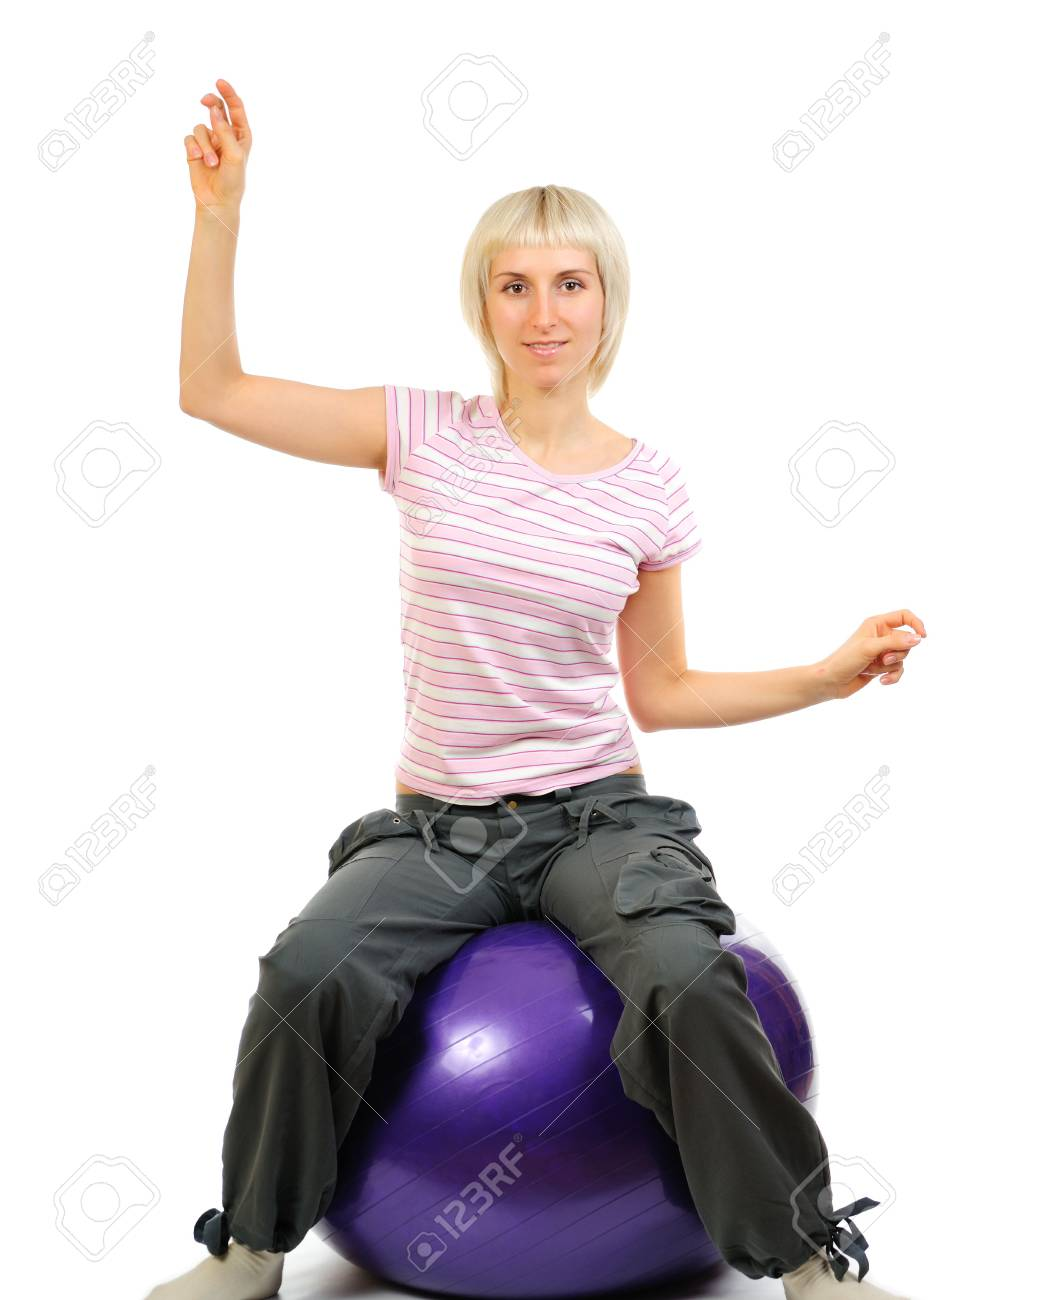 Girl on blue ball isolated on white background Stock Photo - 6110925